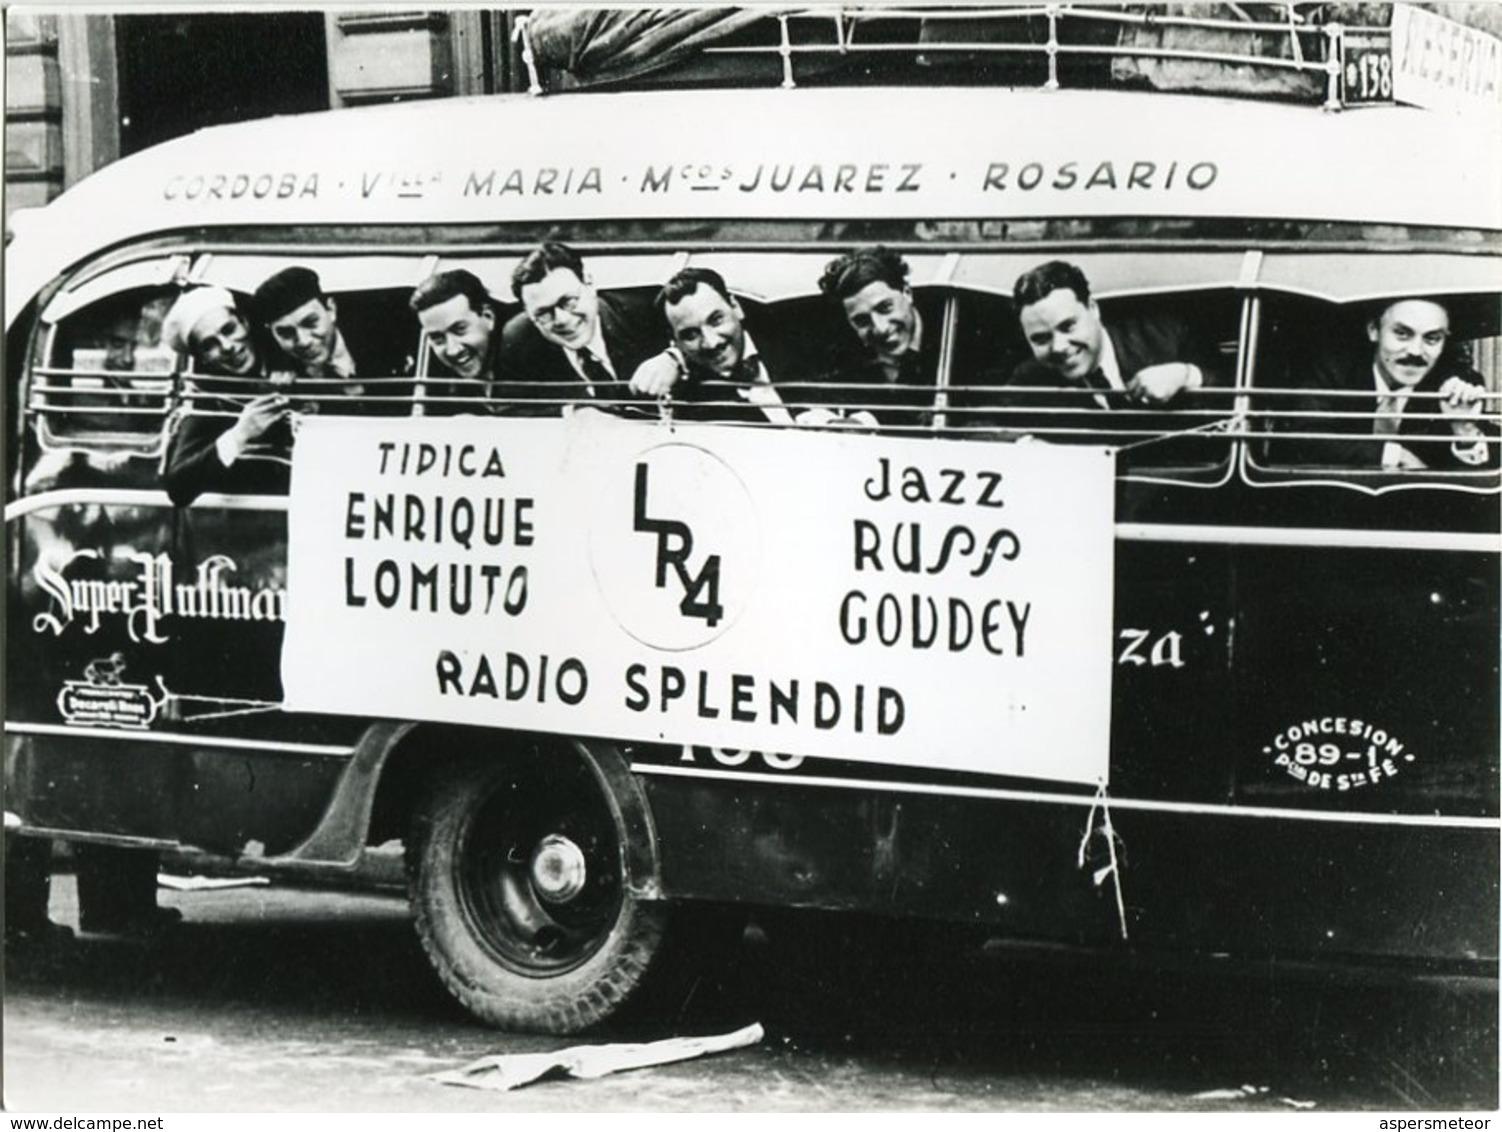 COLECTIVO DE TANGO ORQUESTA TIPICA ENRIQUE LOMUTO, RADIO SPLENDID. ARGENTINA CIRCA 1910's FOTO PHOTO - LILHU - Personalidades Famosas